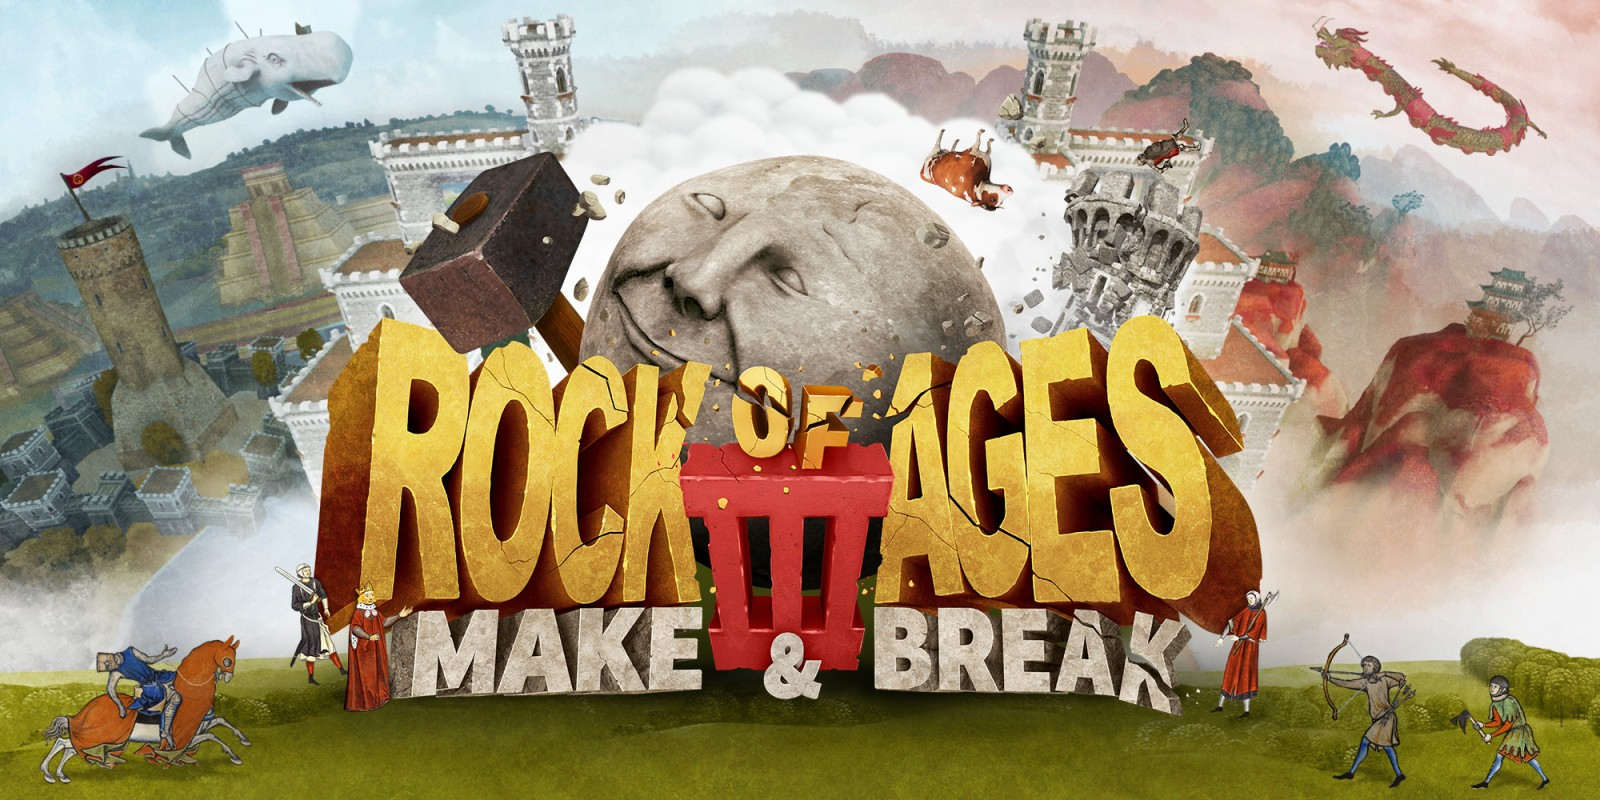 Rock of Ages 3: Make & Break - Análise | Starbit